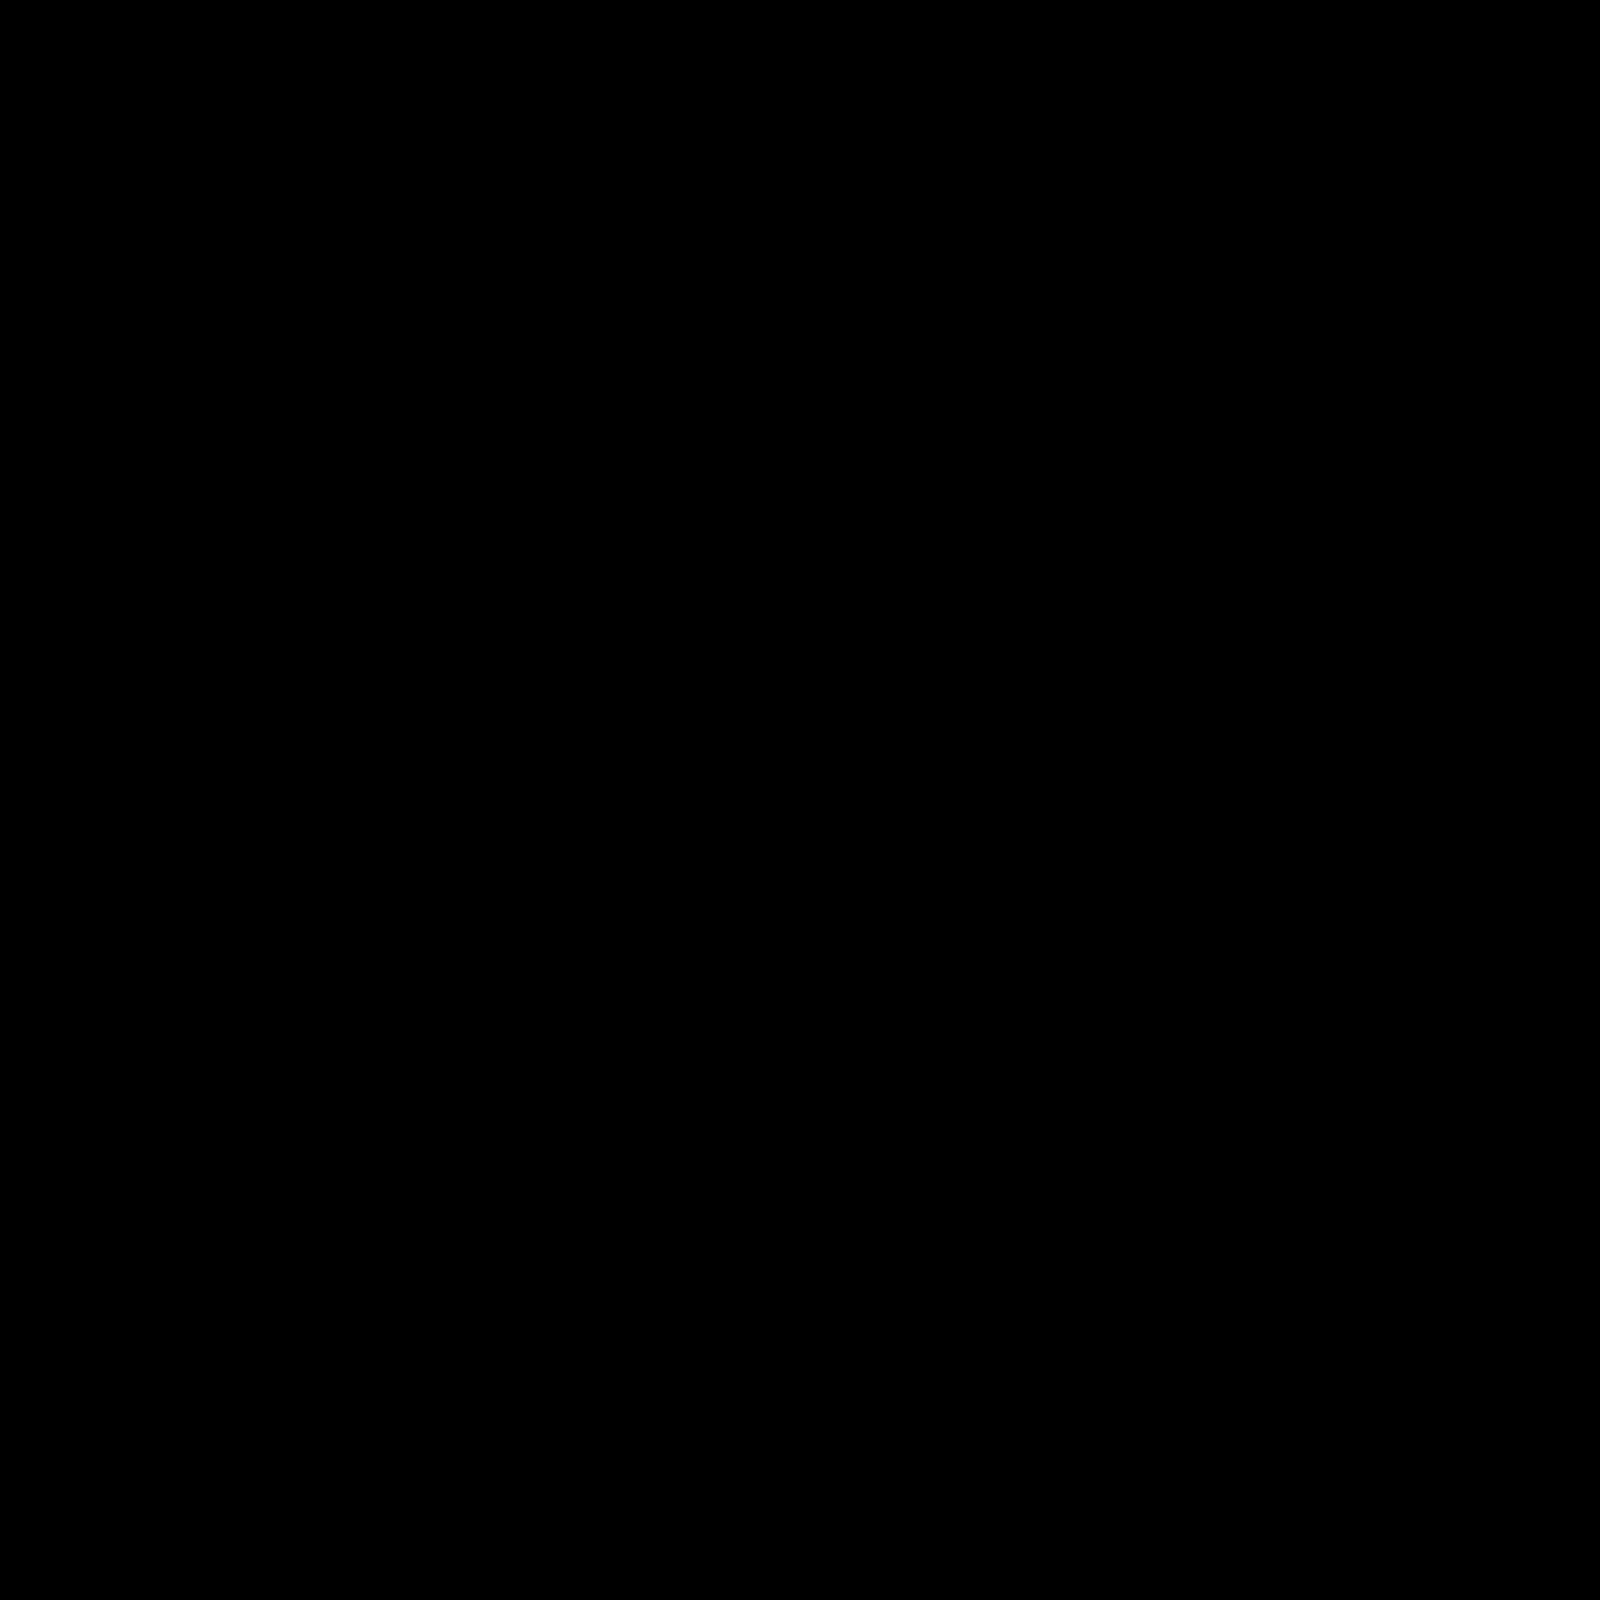 Gravar CD icon